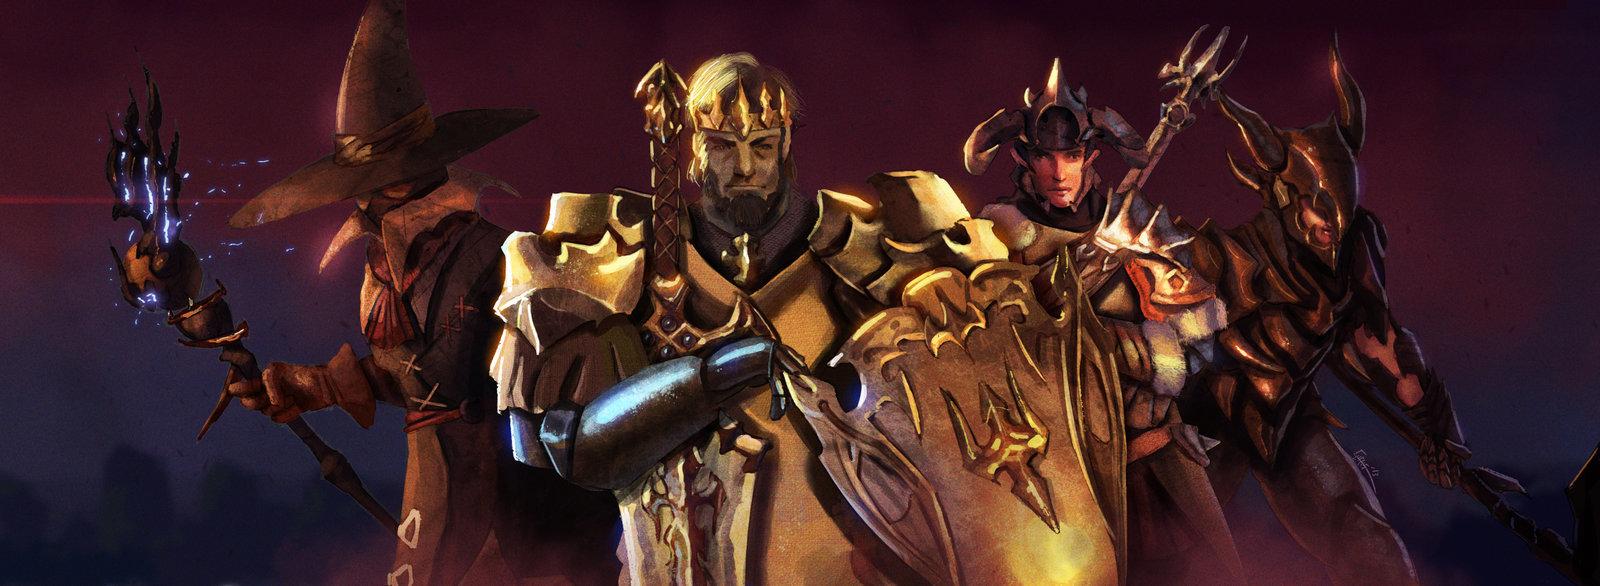 Chris shehan final fantasy by zhourules d6knmsl